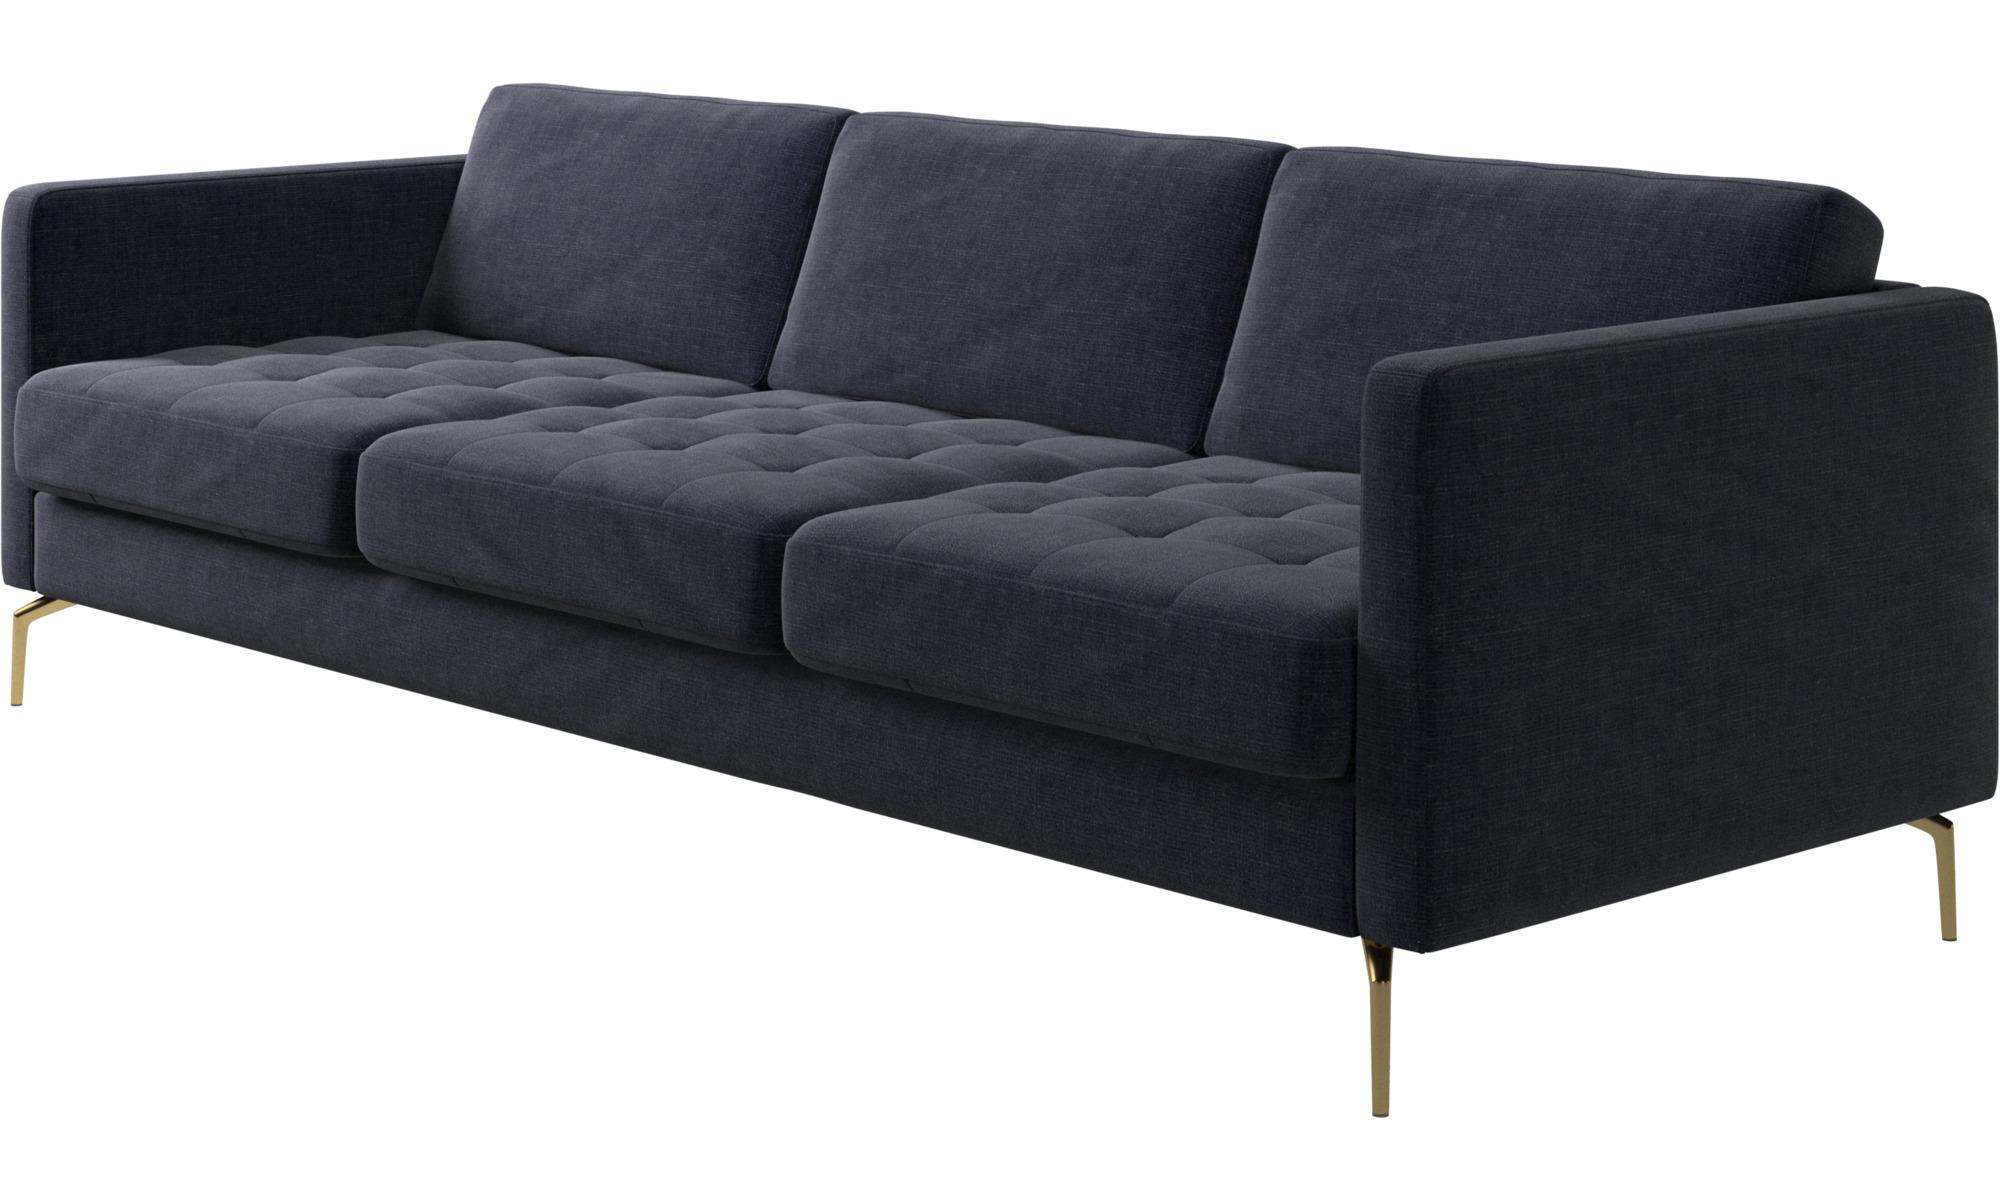 Full Size of 3 Sitzer Sofa Und 2 Sessel Leder Mit Relaxfunktion Bettfunktion Ikea Ektorp Nockeby Couch Schlaffunktion Bei Roller Federkern Rot Grau Bettkasten Klippan Sofas Sofa 3 Sitzer Sofa